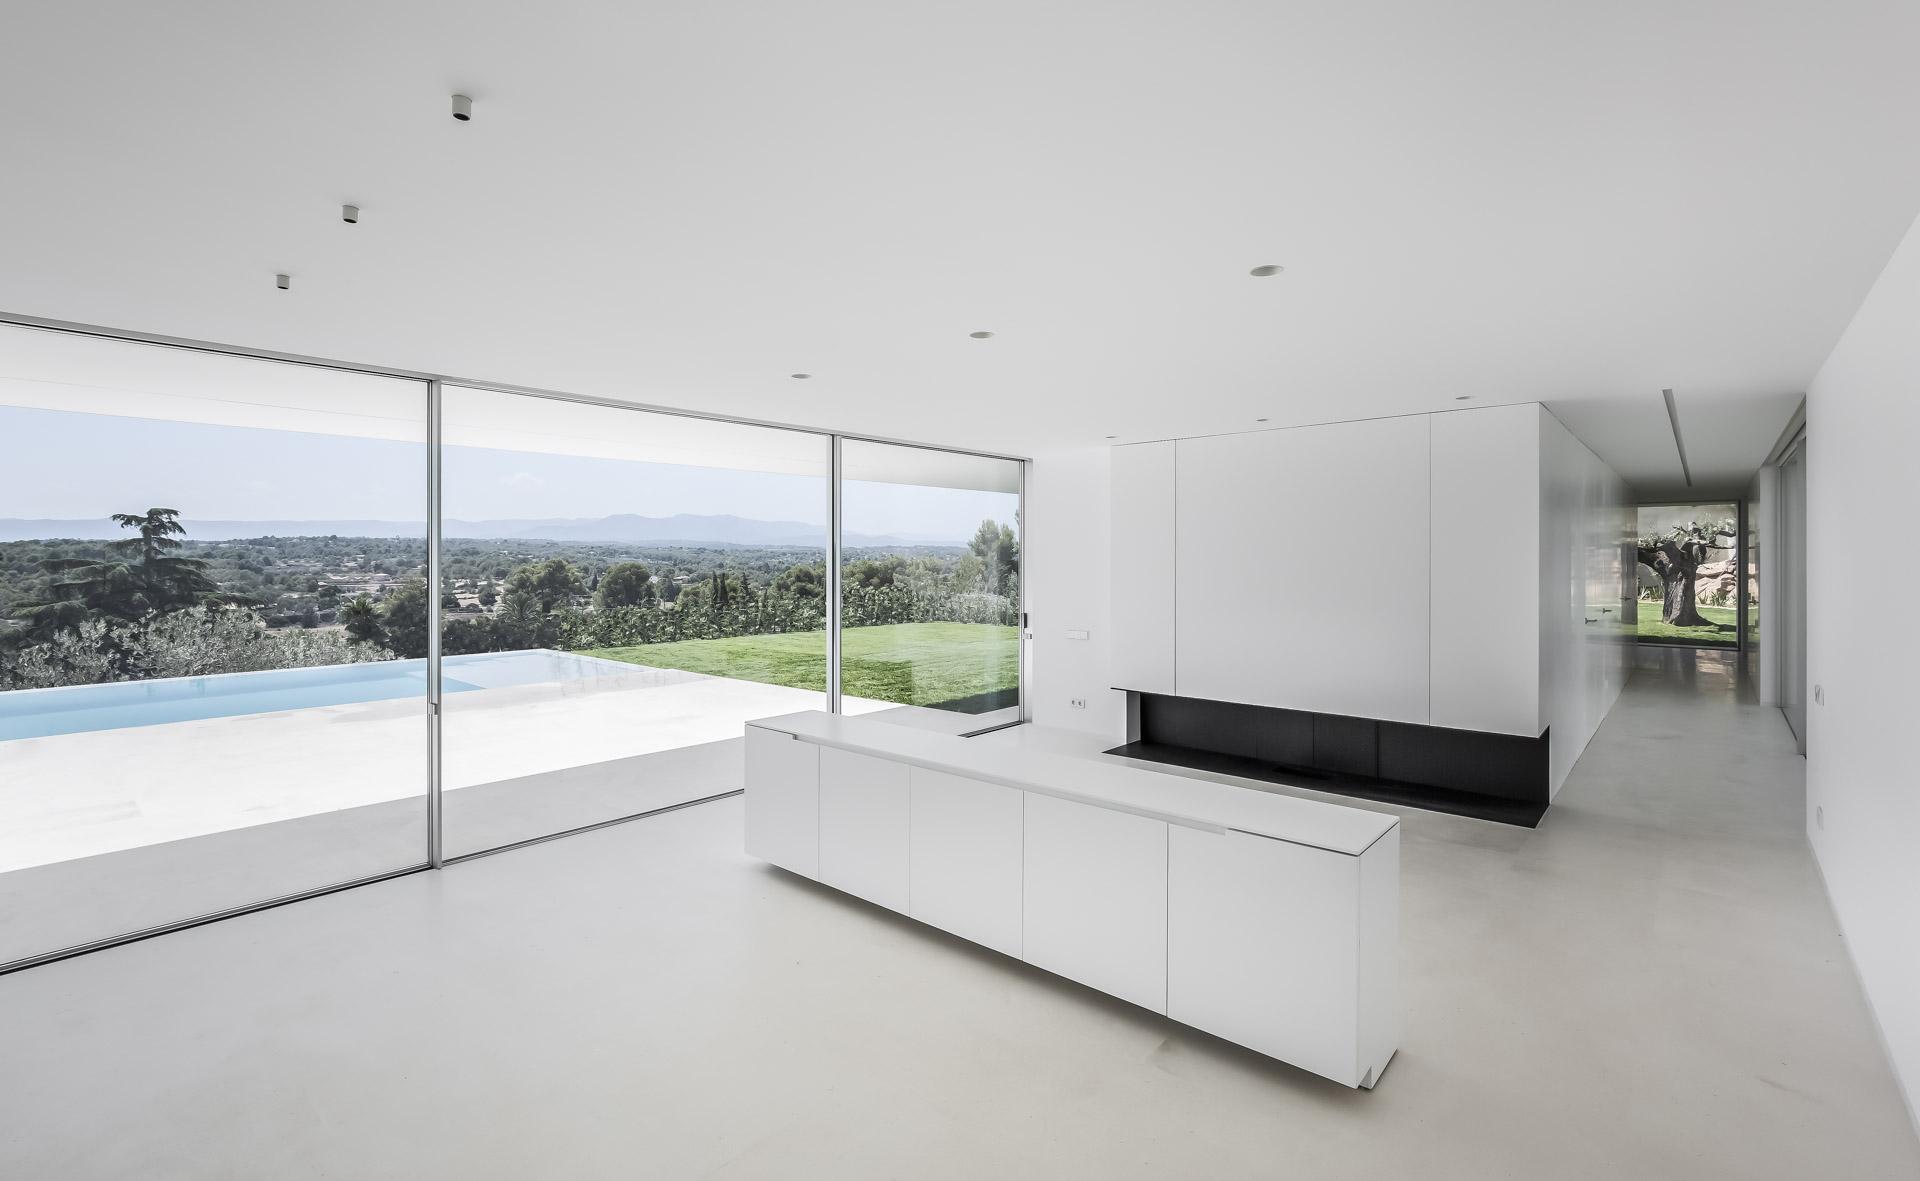 fotografia-arquitectura-valencia-german-cabo-gallardo-llopis-villamarchante-vivienda-24